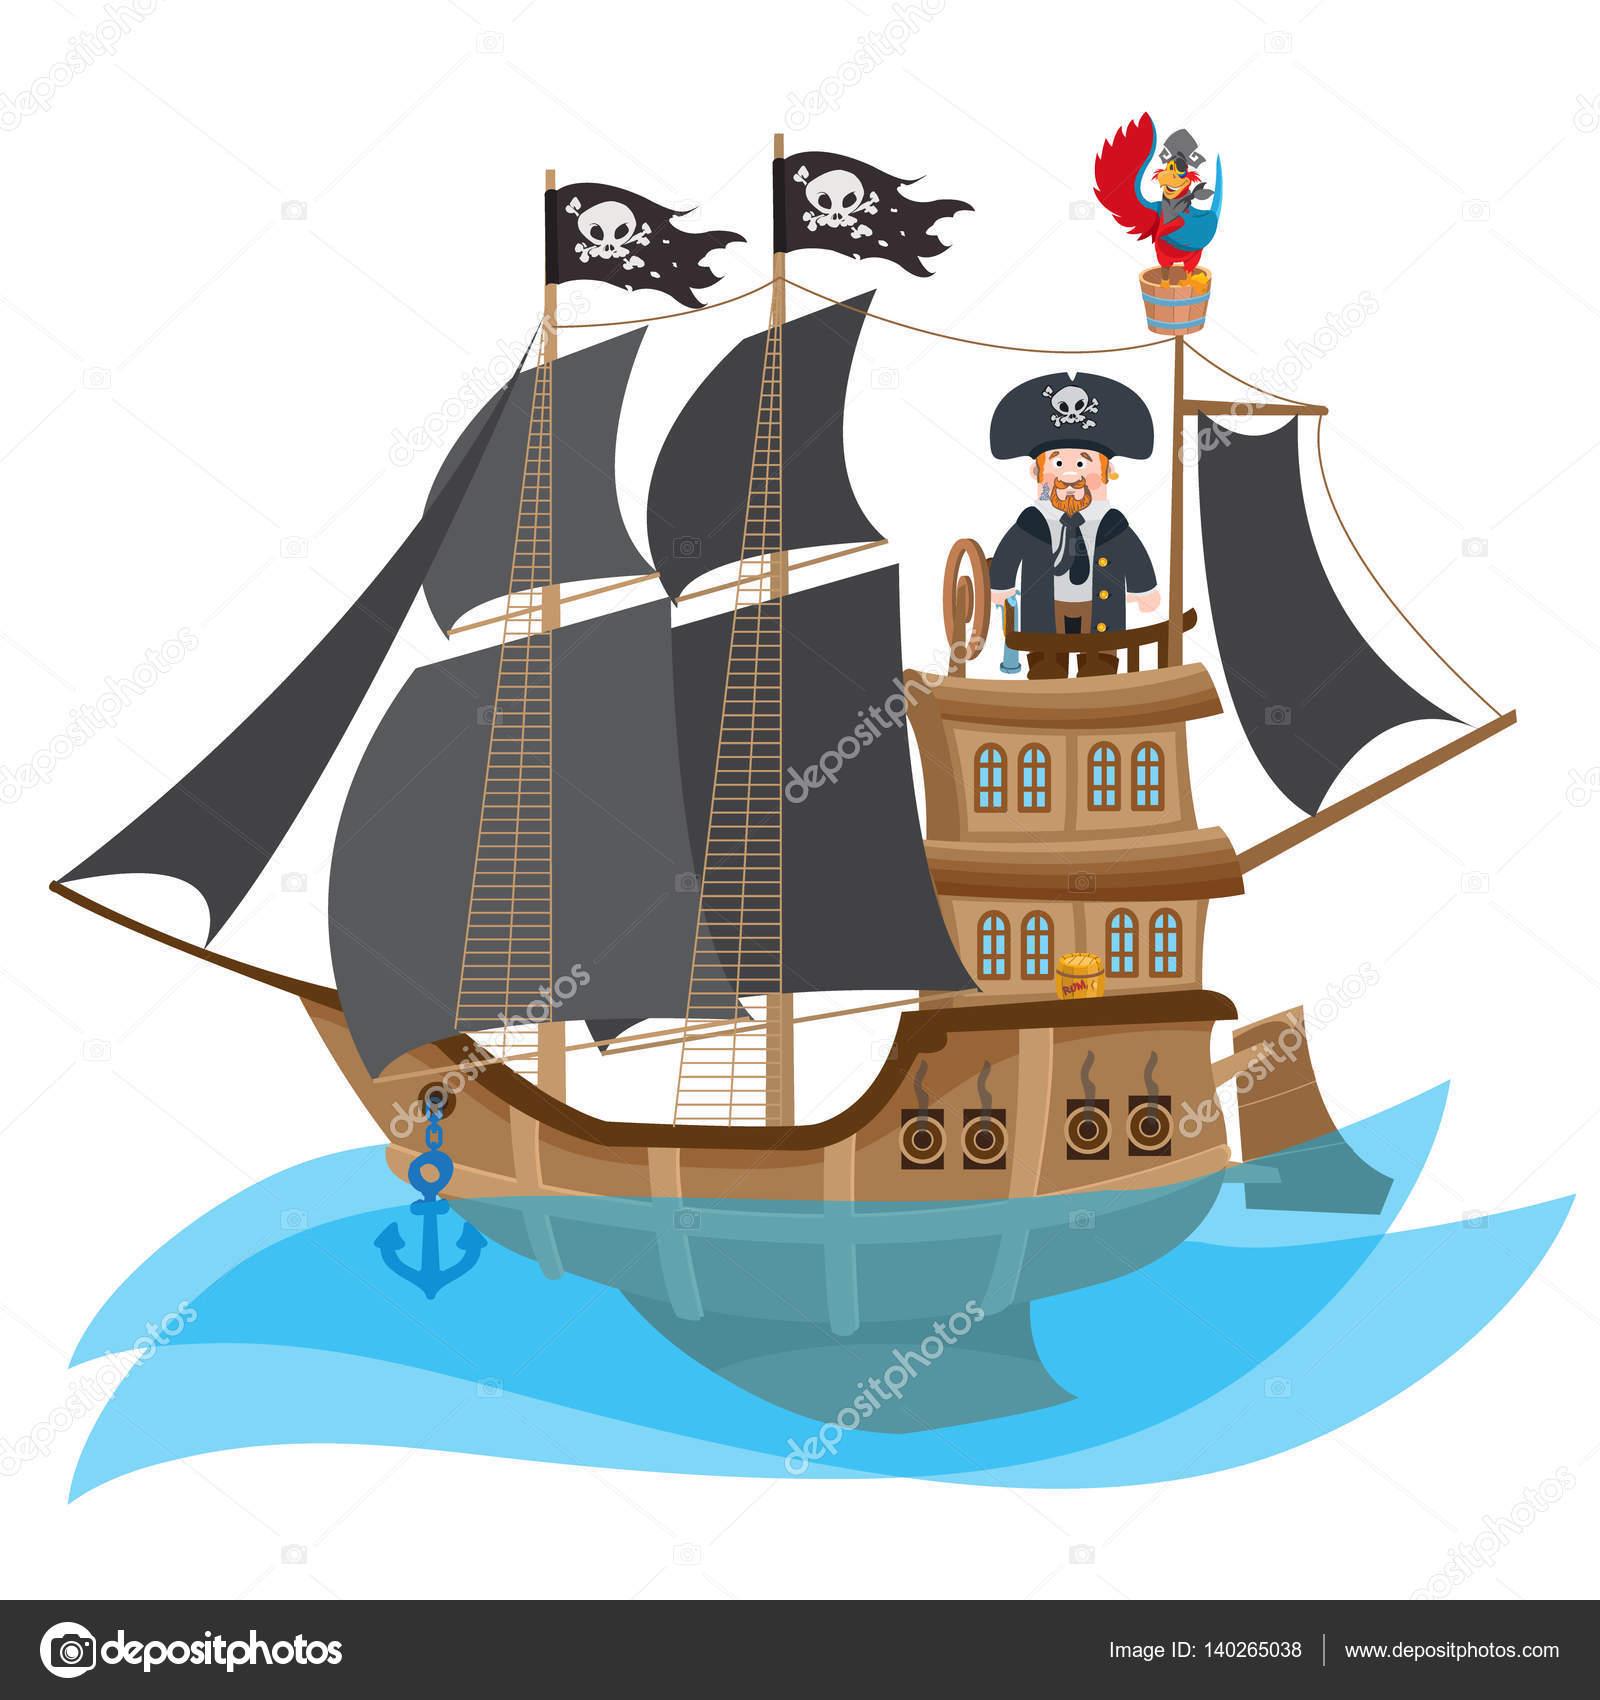 Imágenes Barco Caricatura Pirata De La Caricatura En Barco